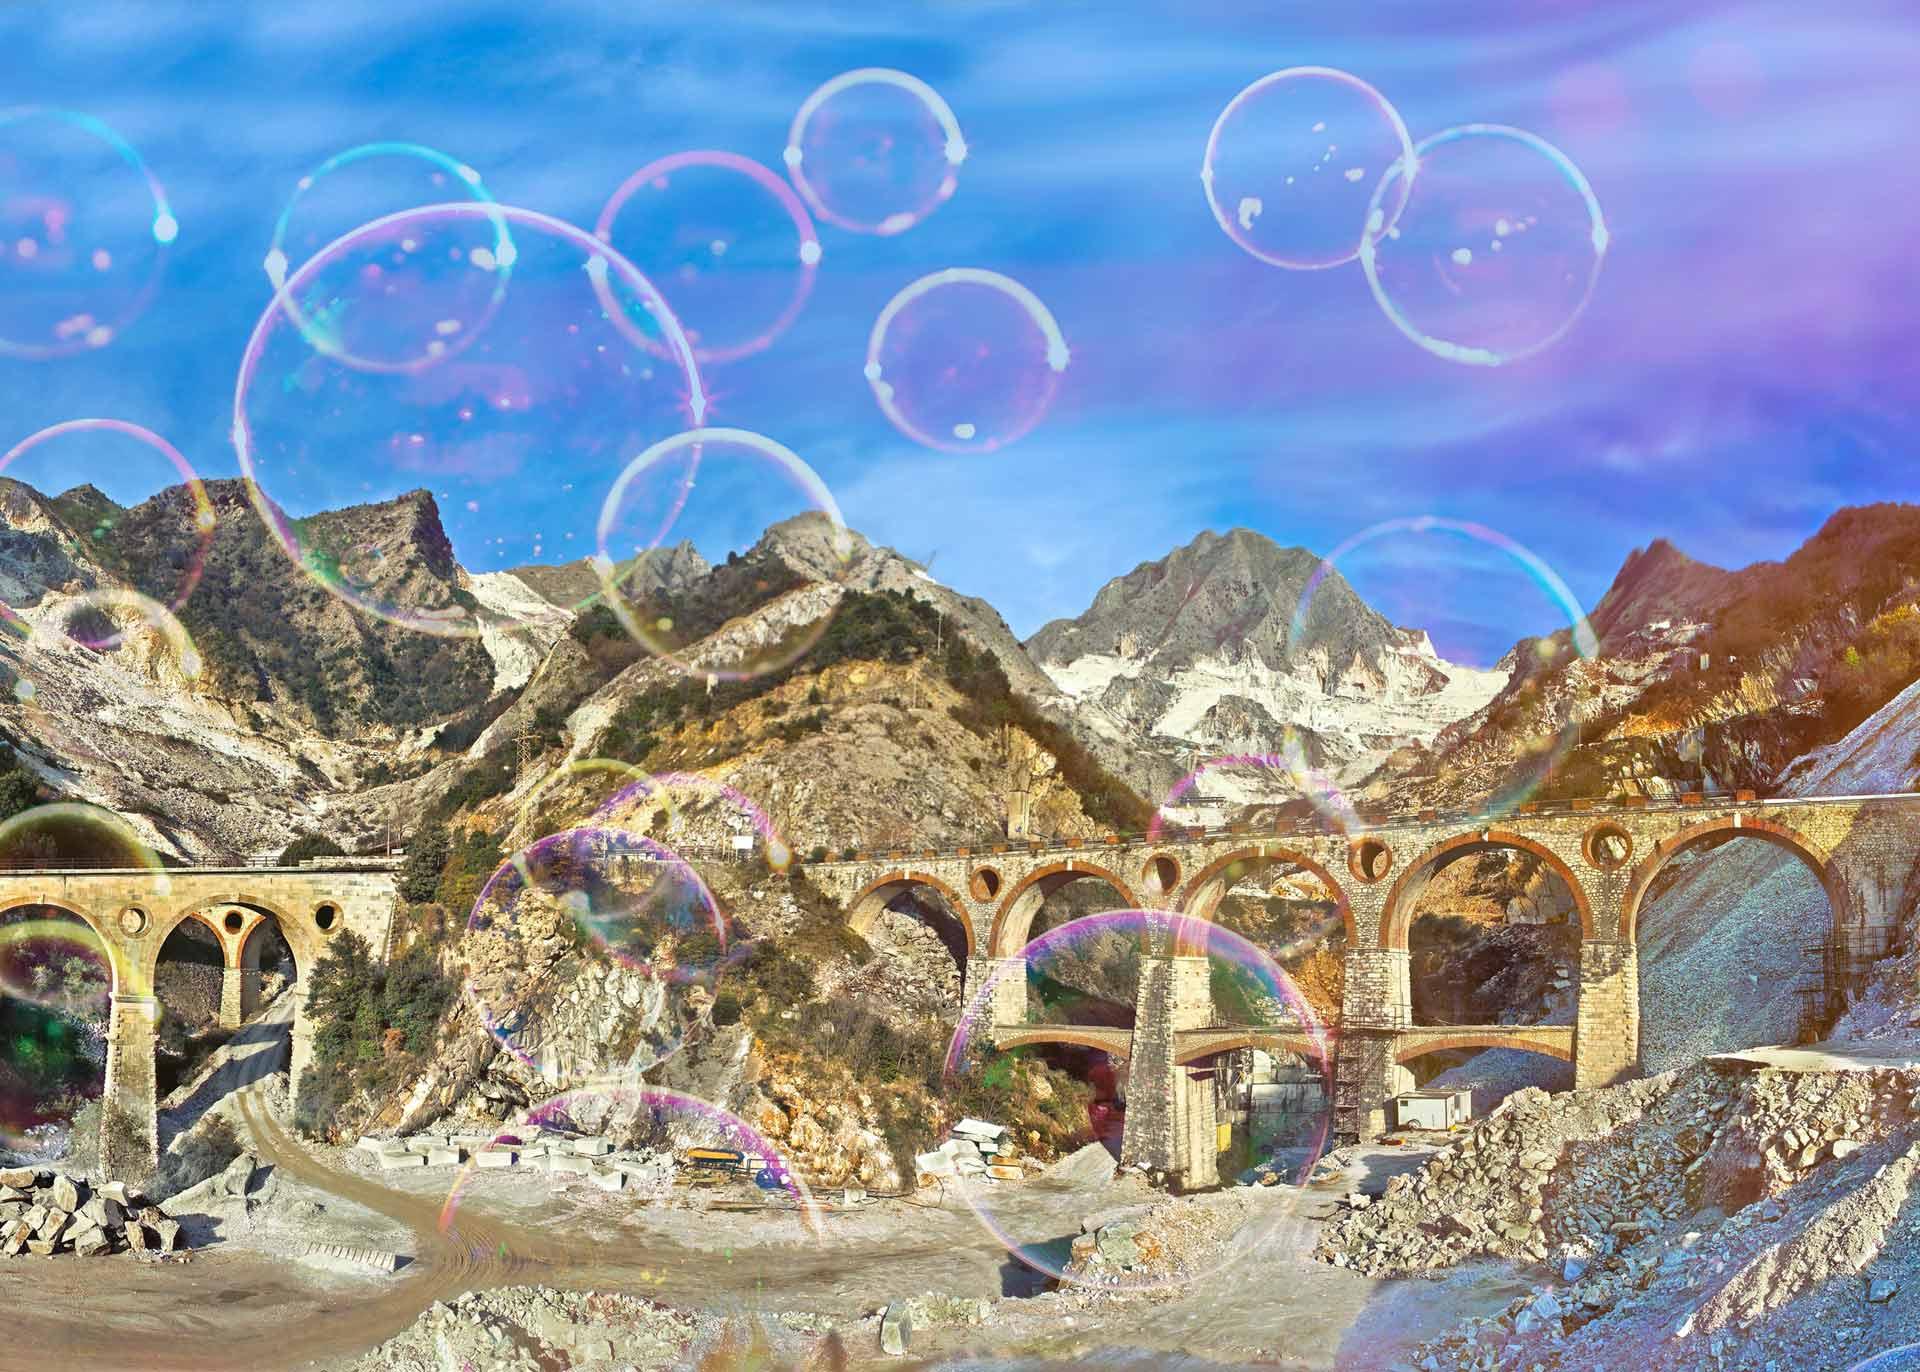 Carrara e bolle di sapone